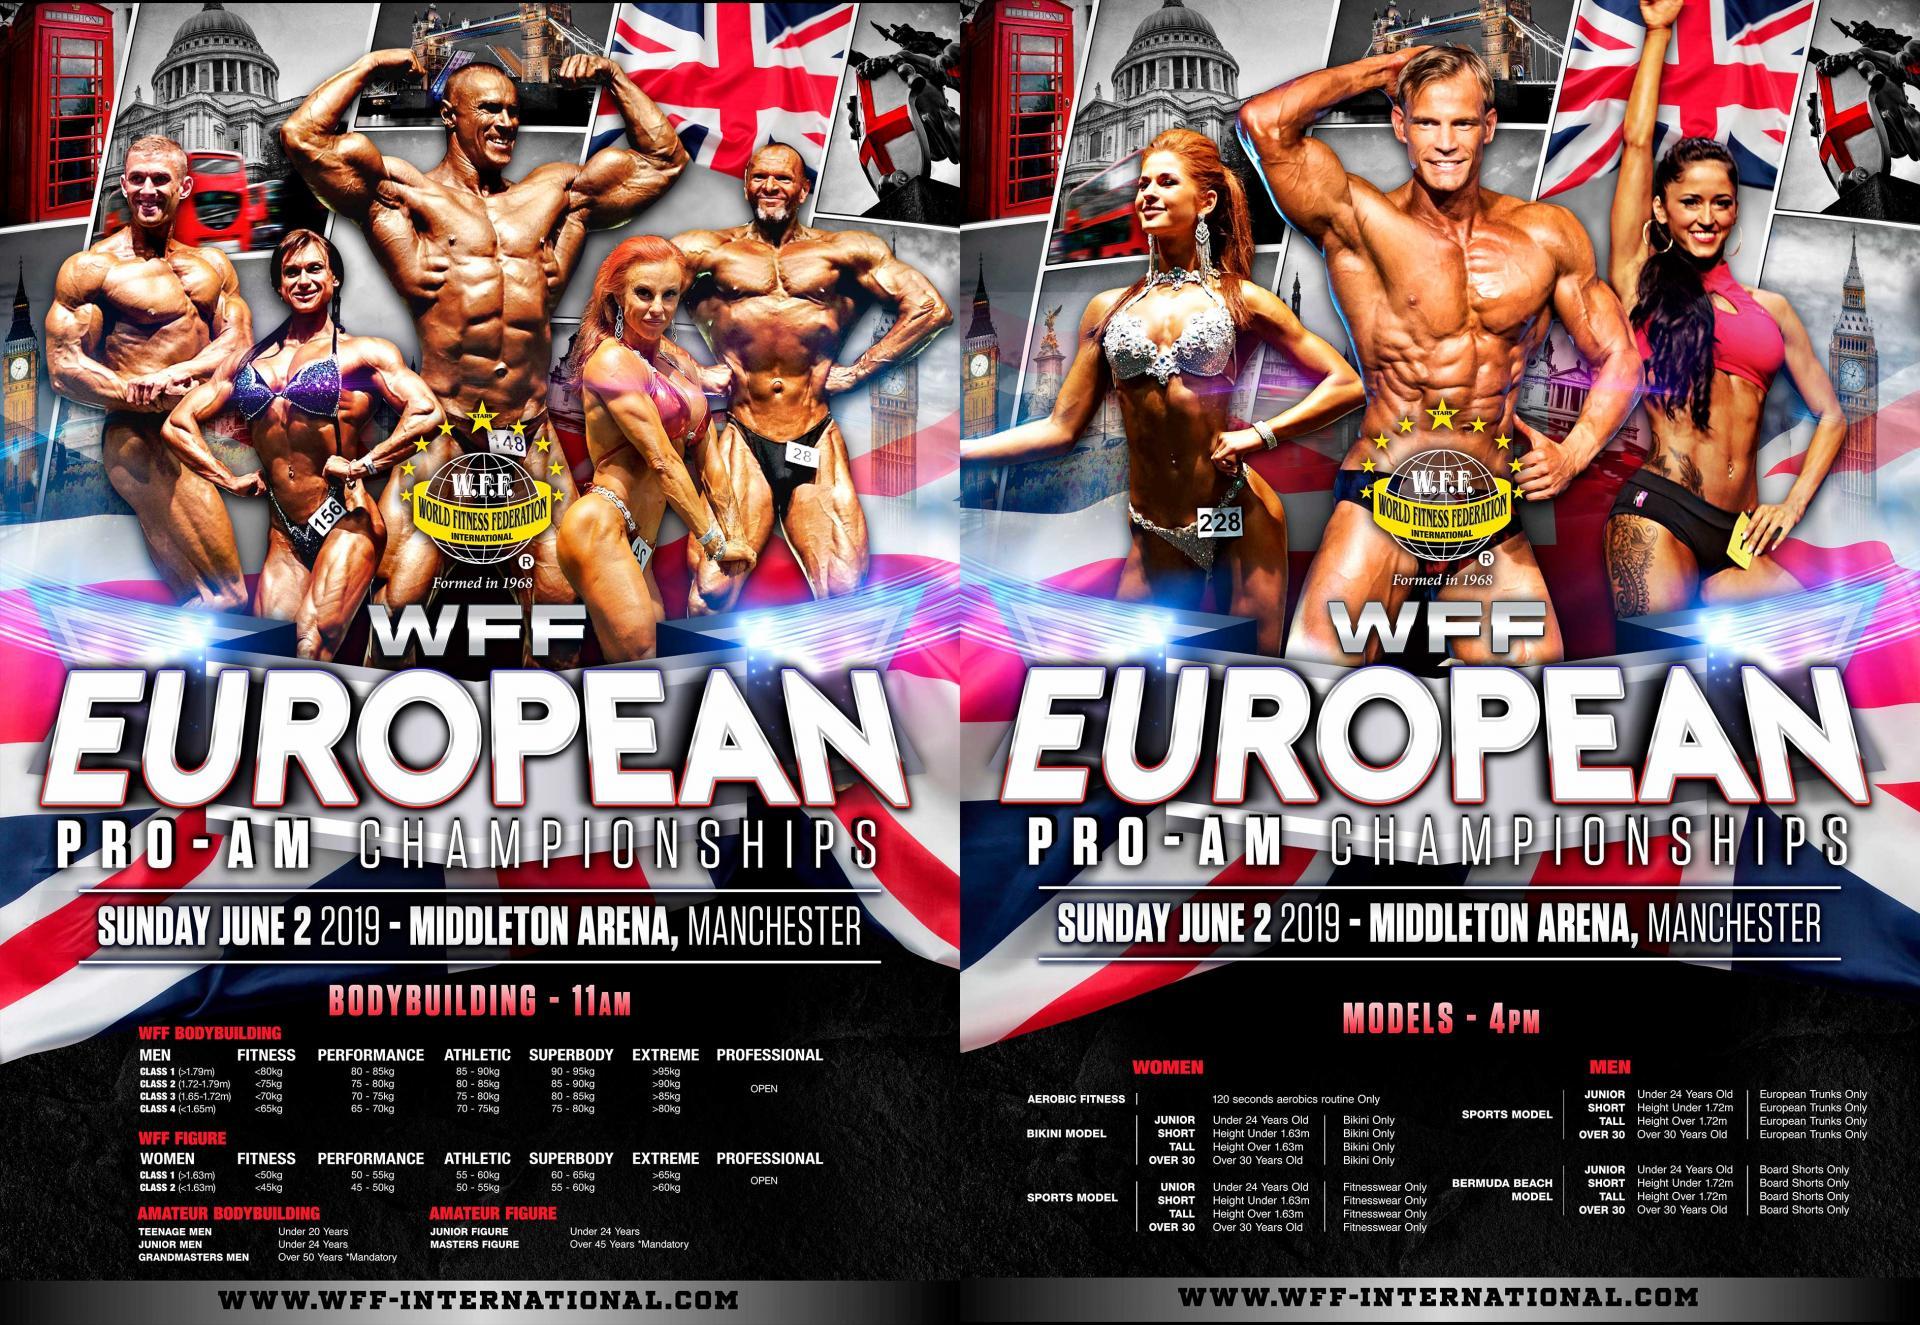 2019 wff european models 05x